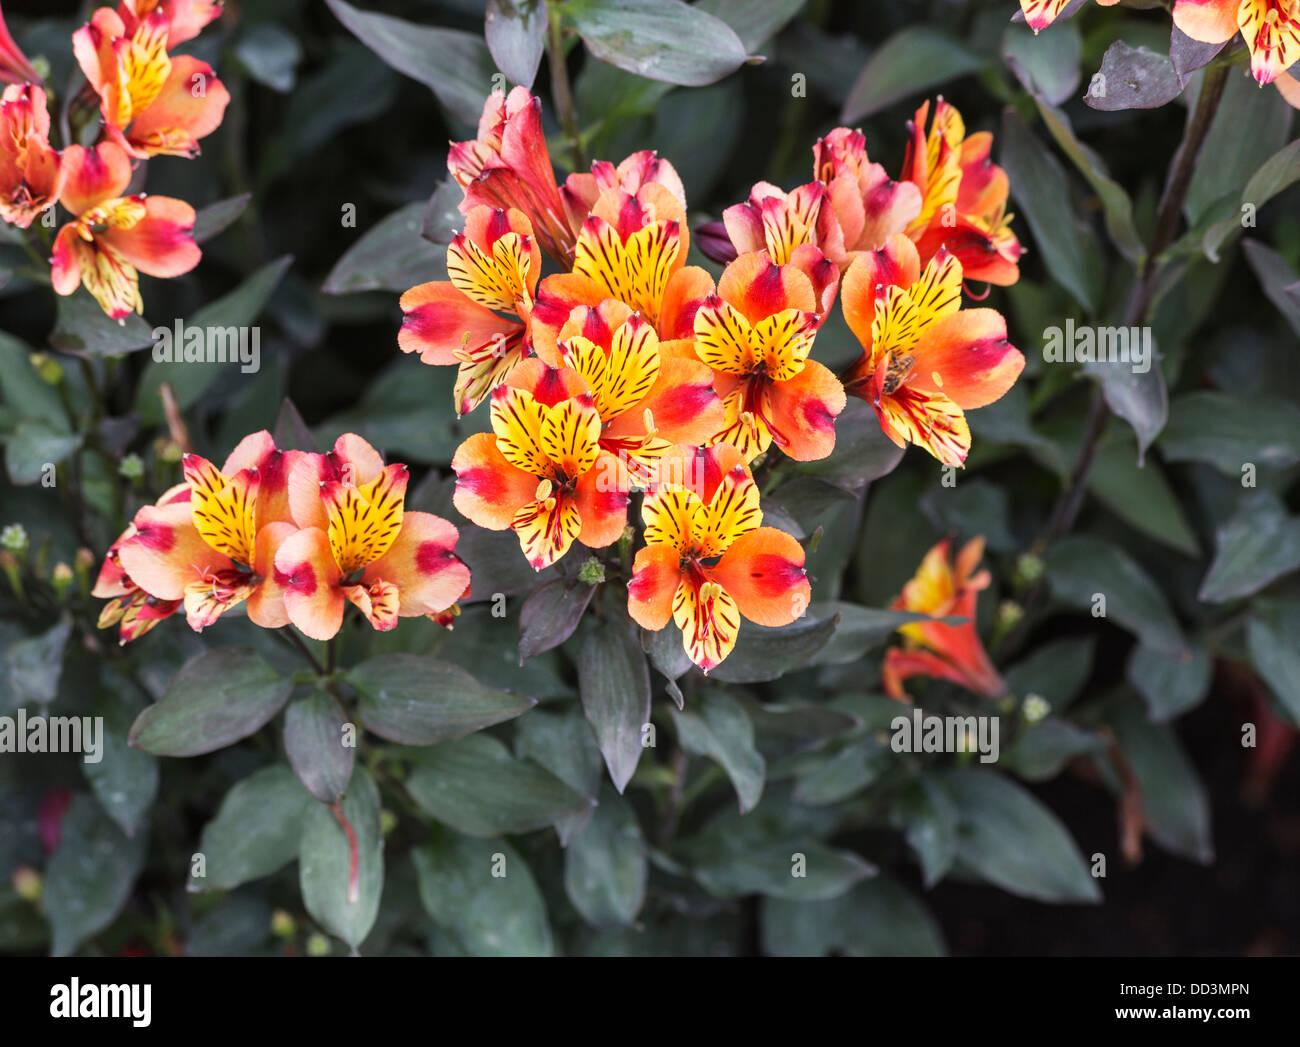 Orange And Yellow Alstroemeria Flowers Alstroemeriaceae Native To